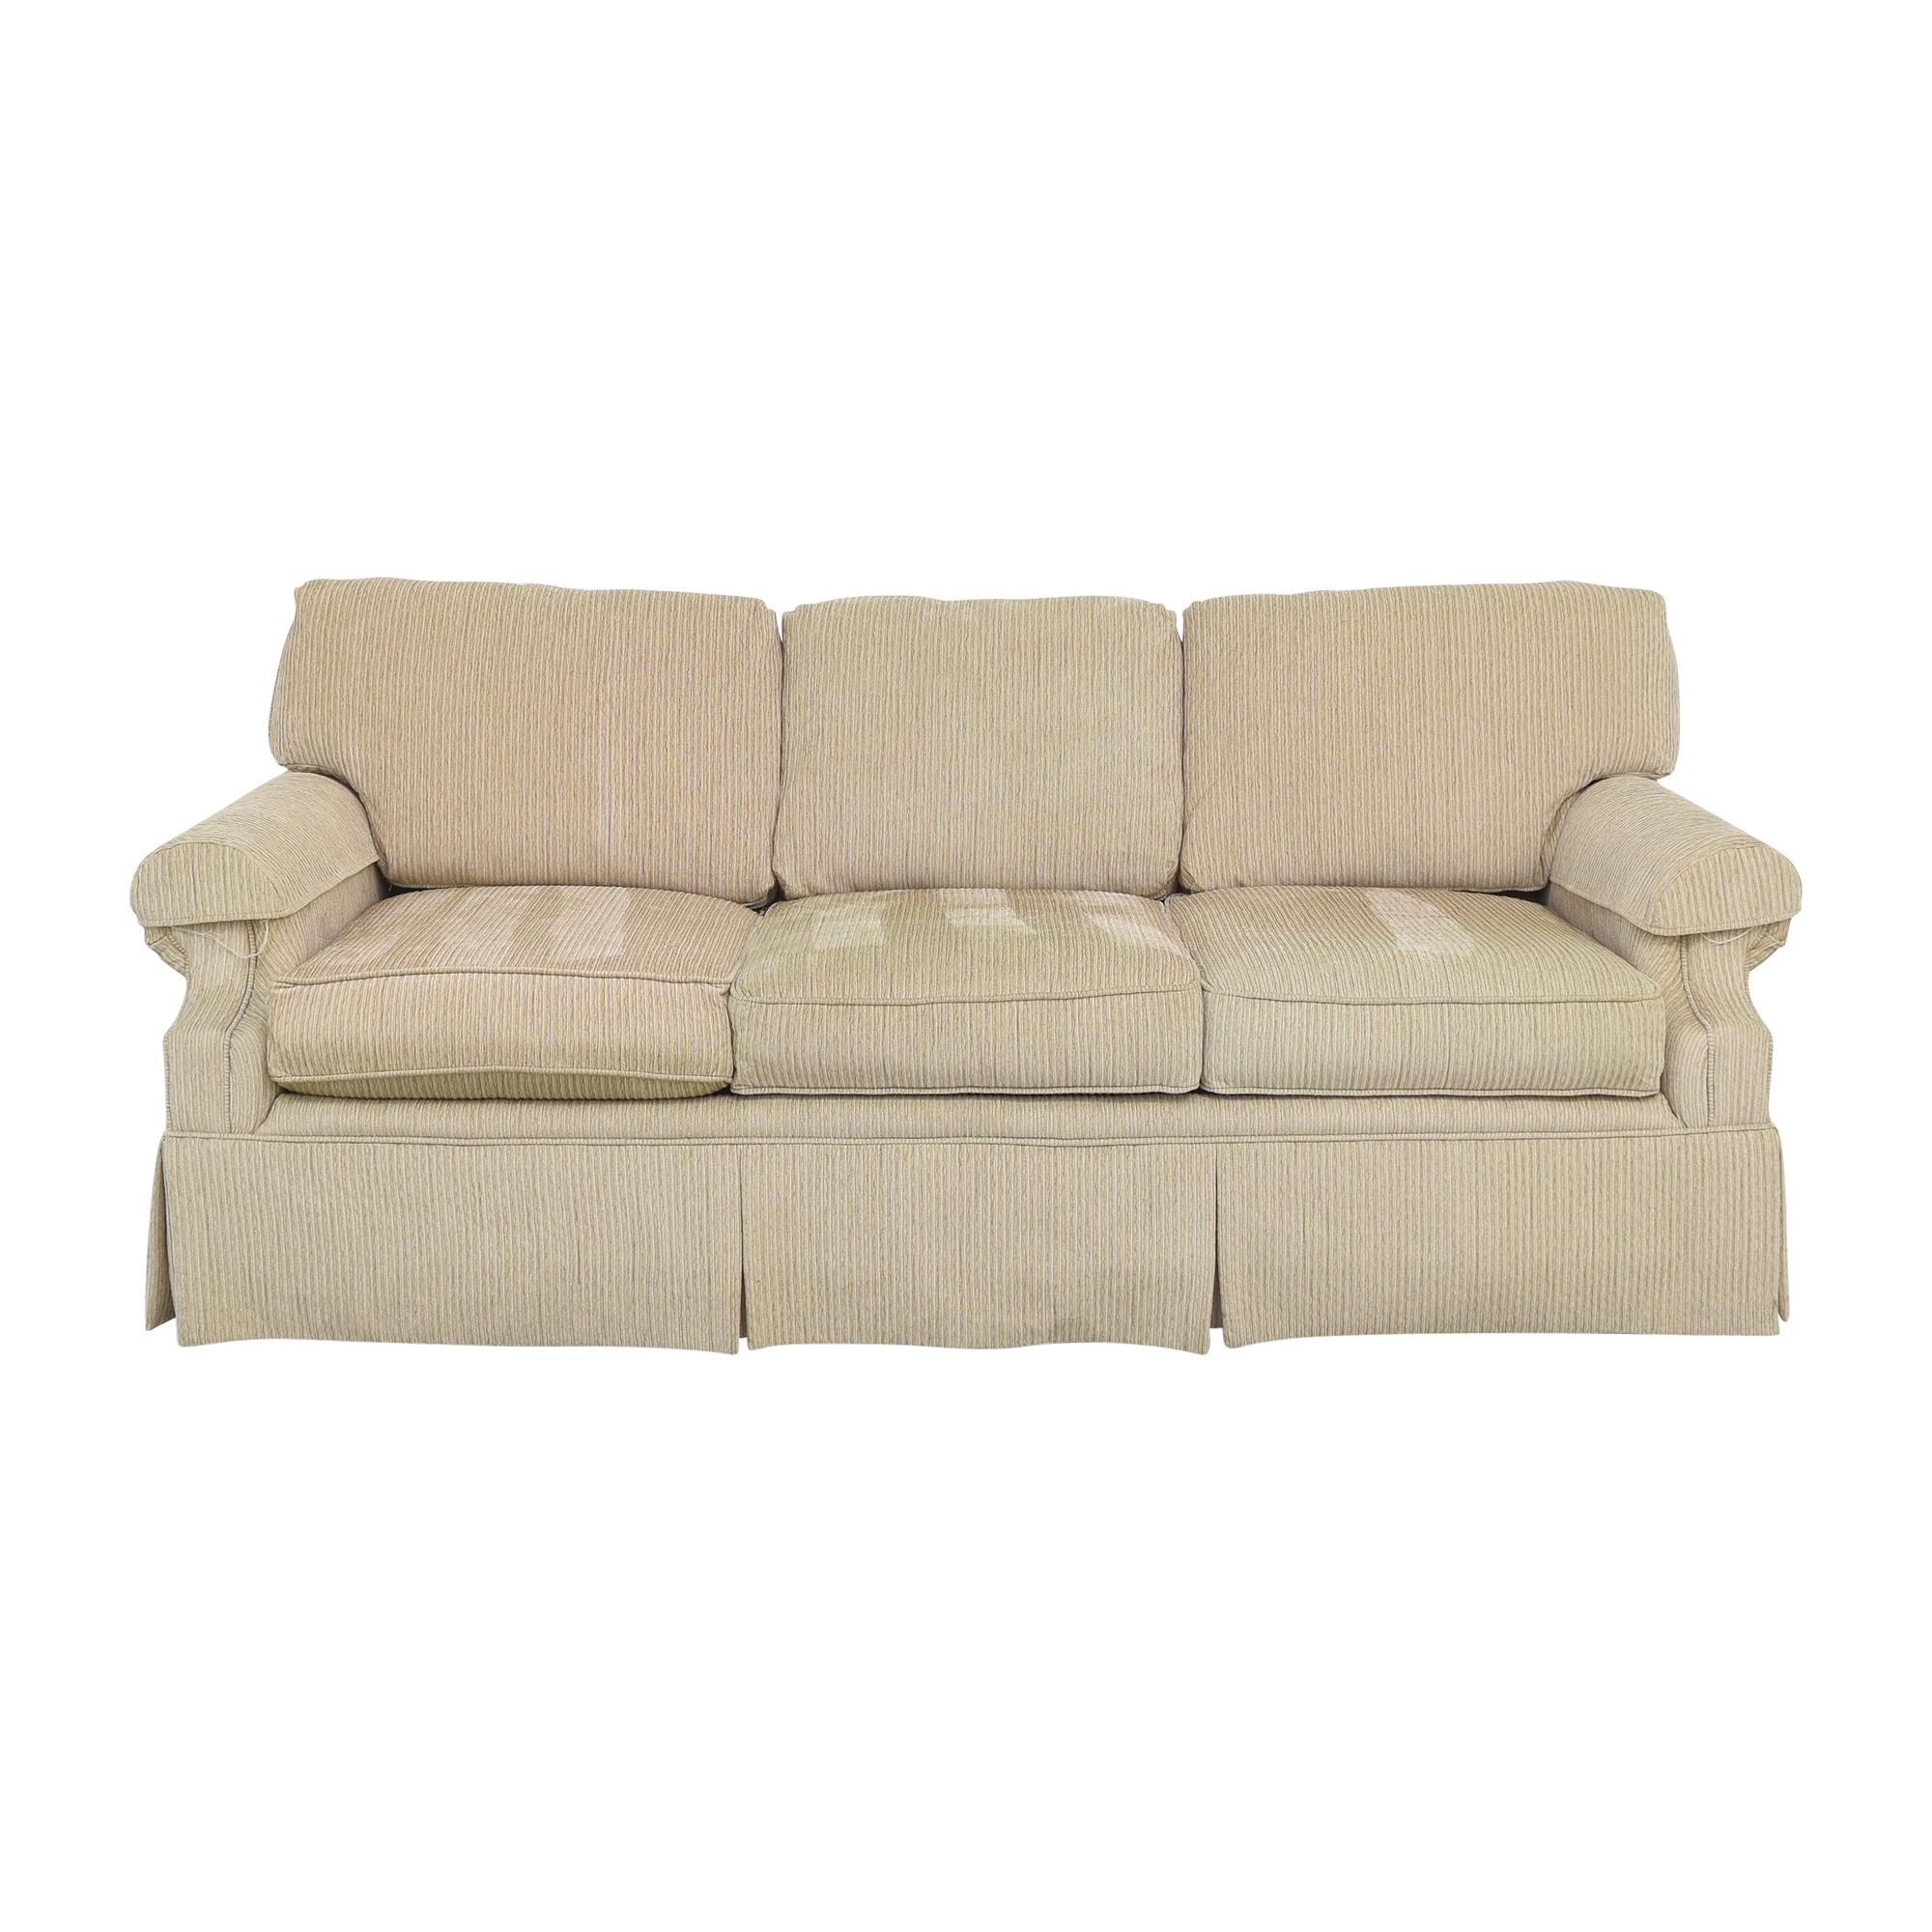 Harden Three Cushion Sofa / Classic Sofas